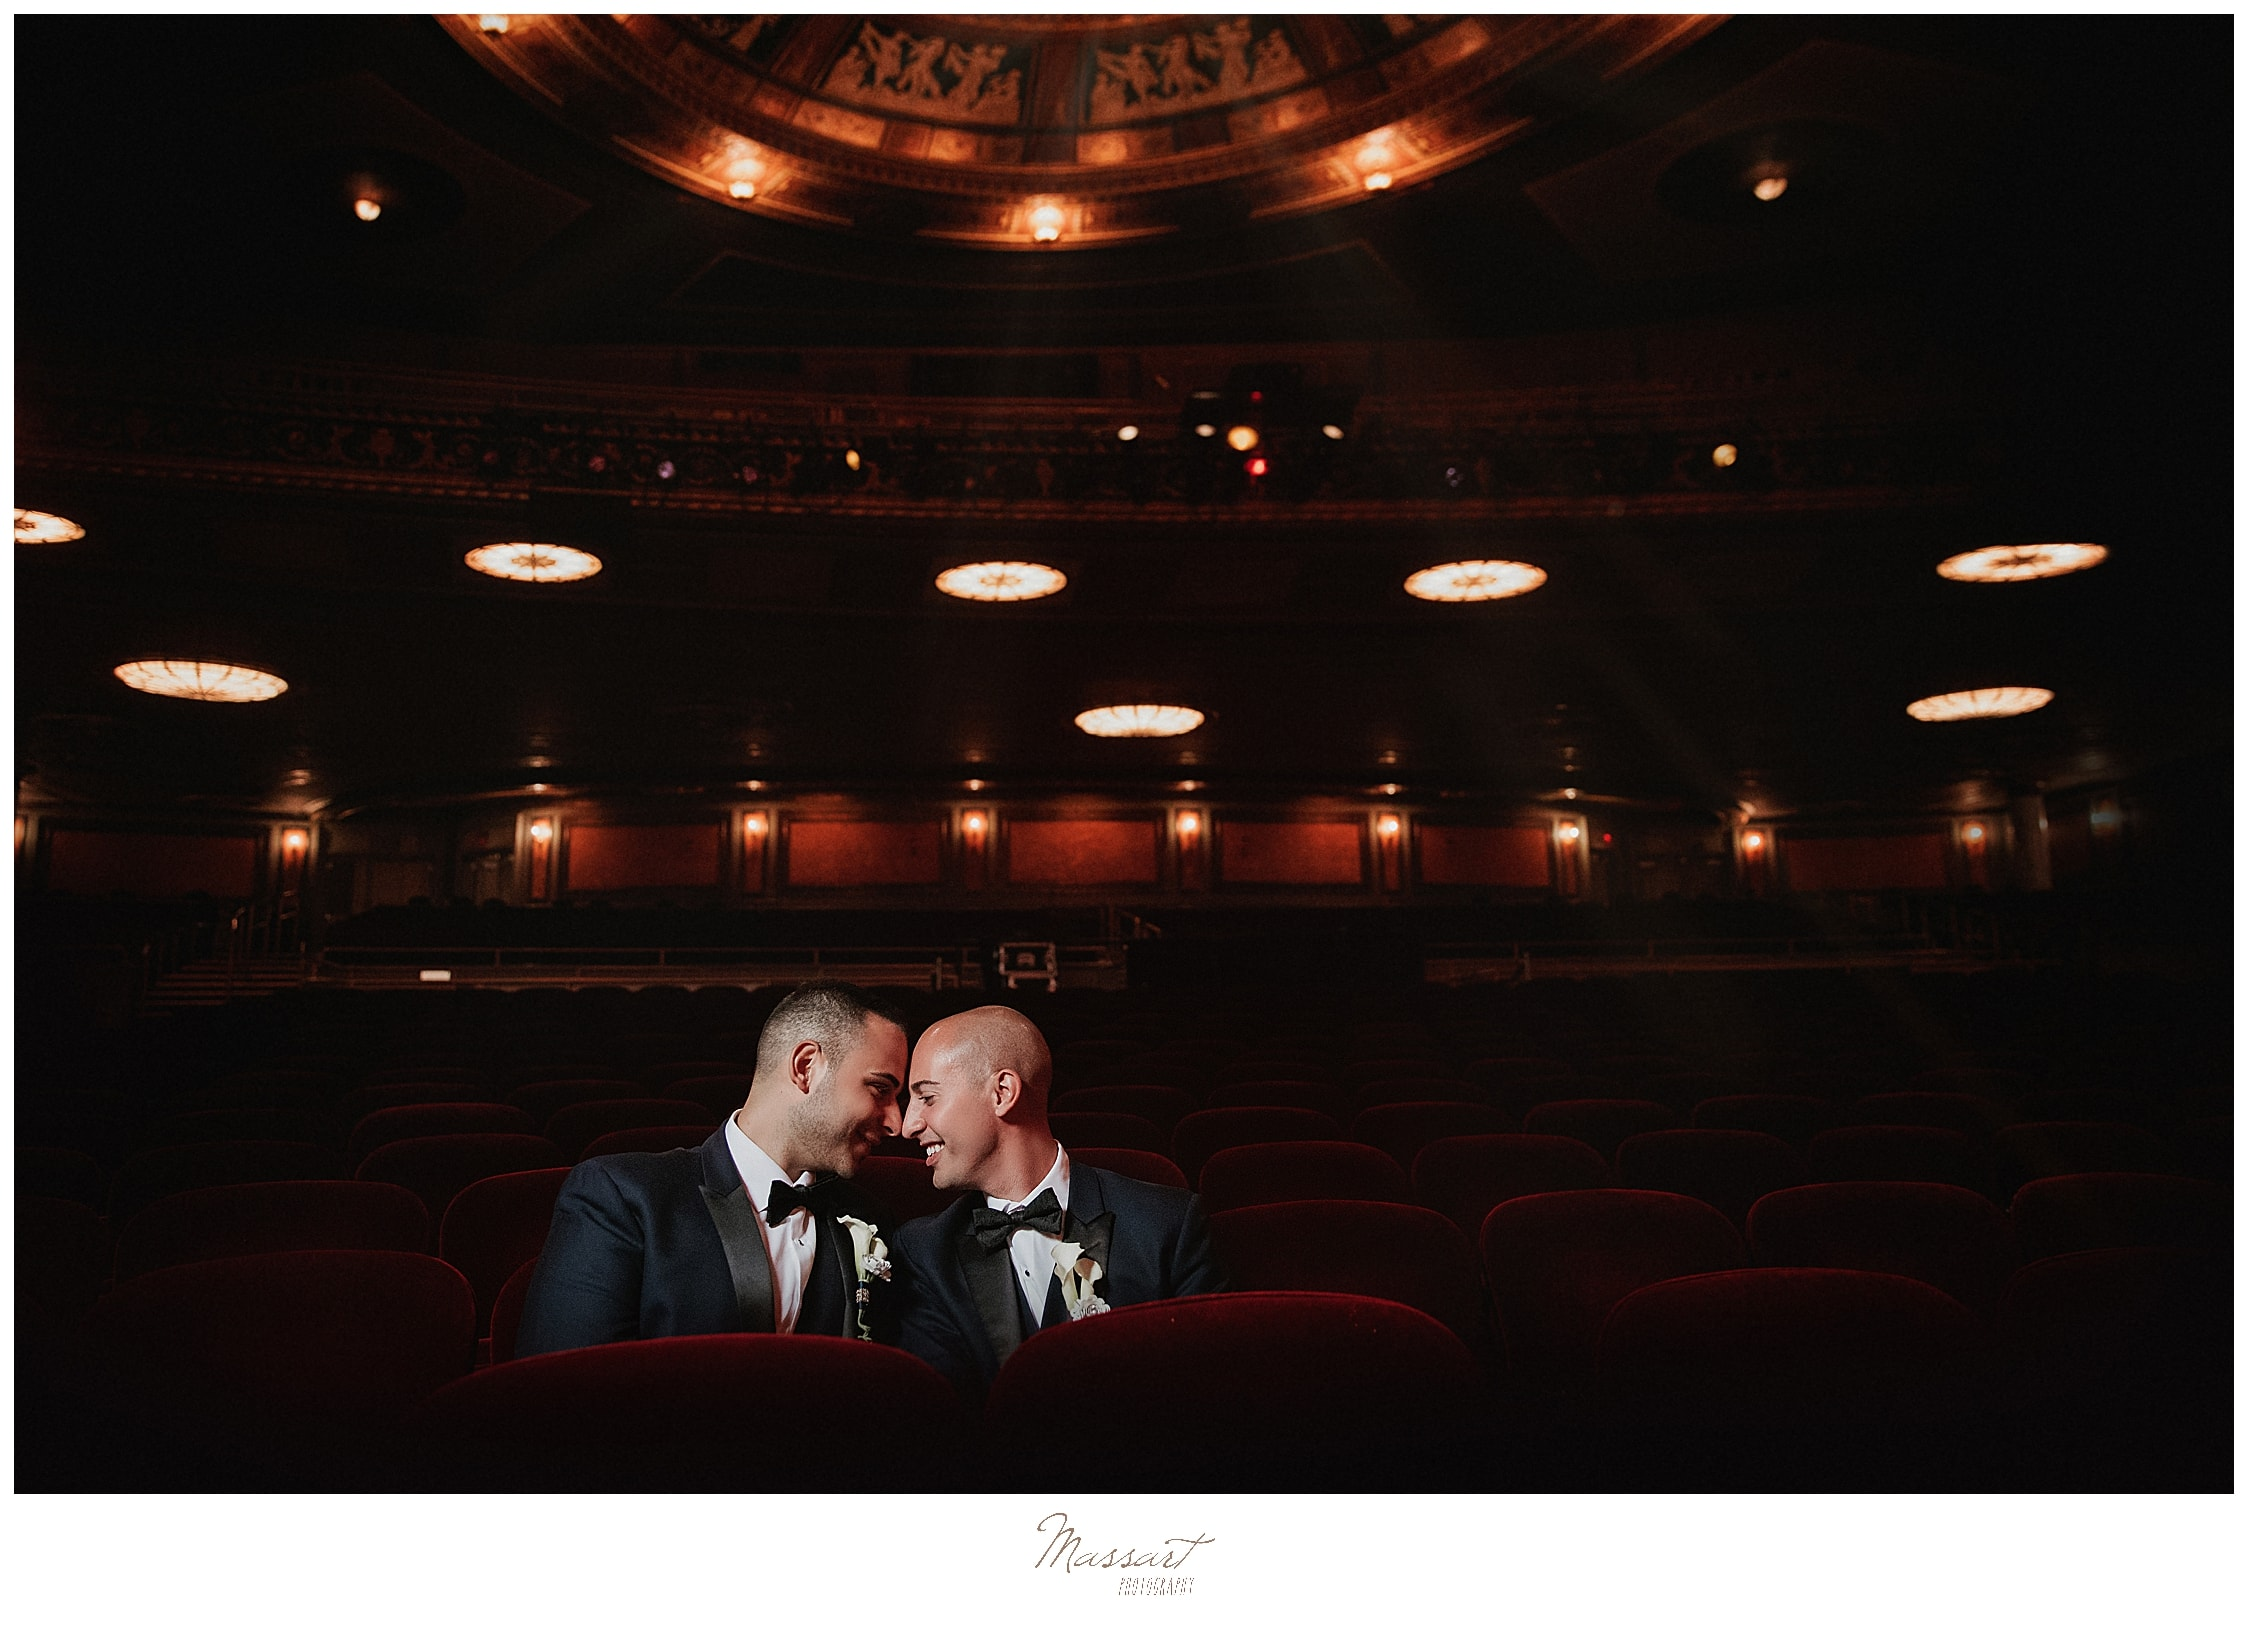 Waterbury CT wedding day at Palace Theater photographed by wedding photographers Massart Photography